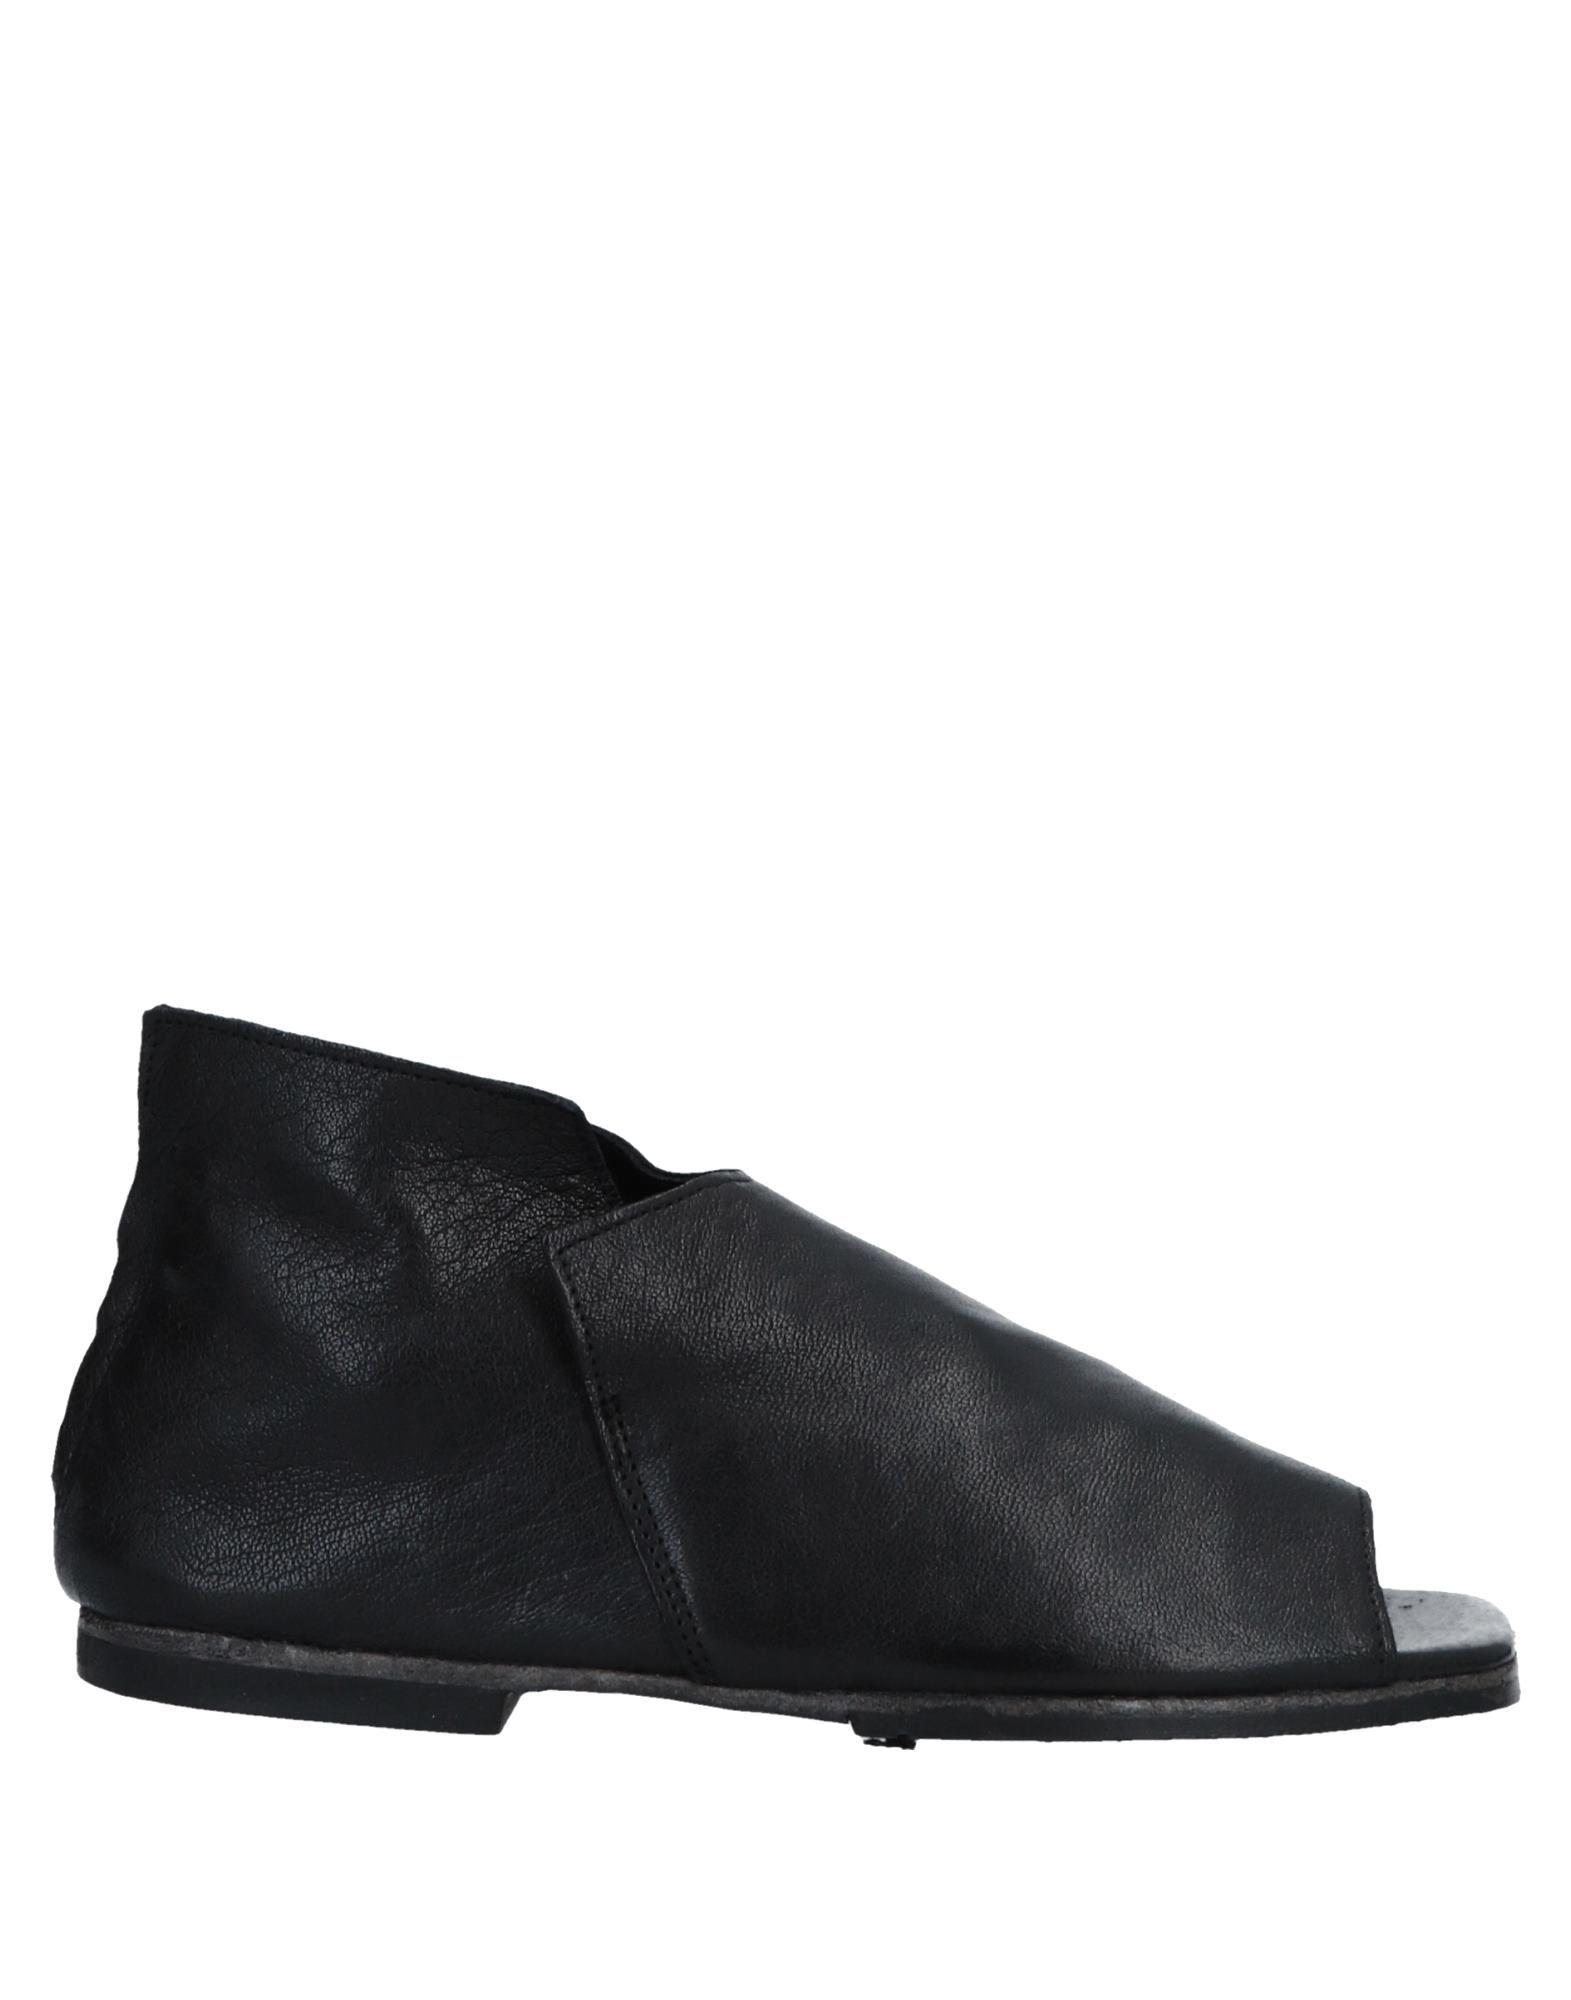 JULIETTE VICO Полусапоги и высокие ботинки